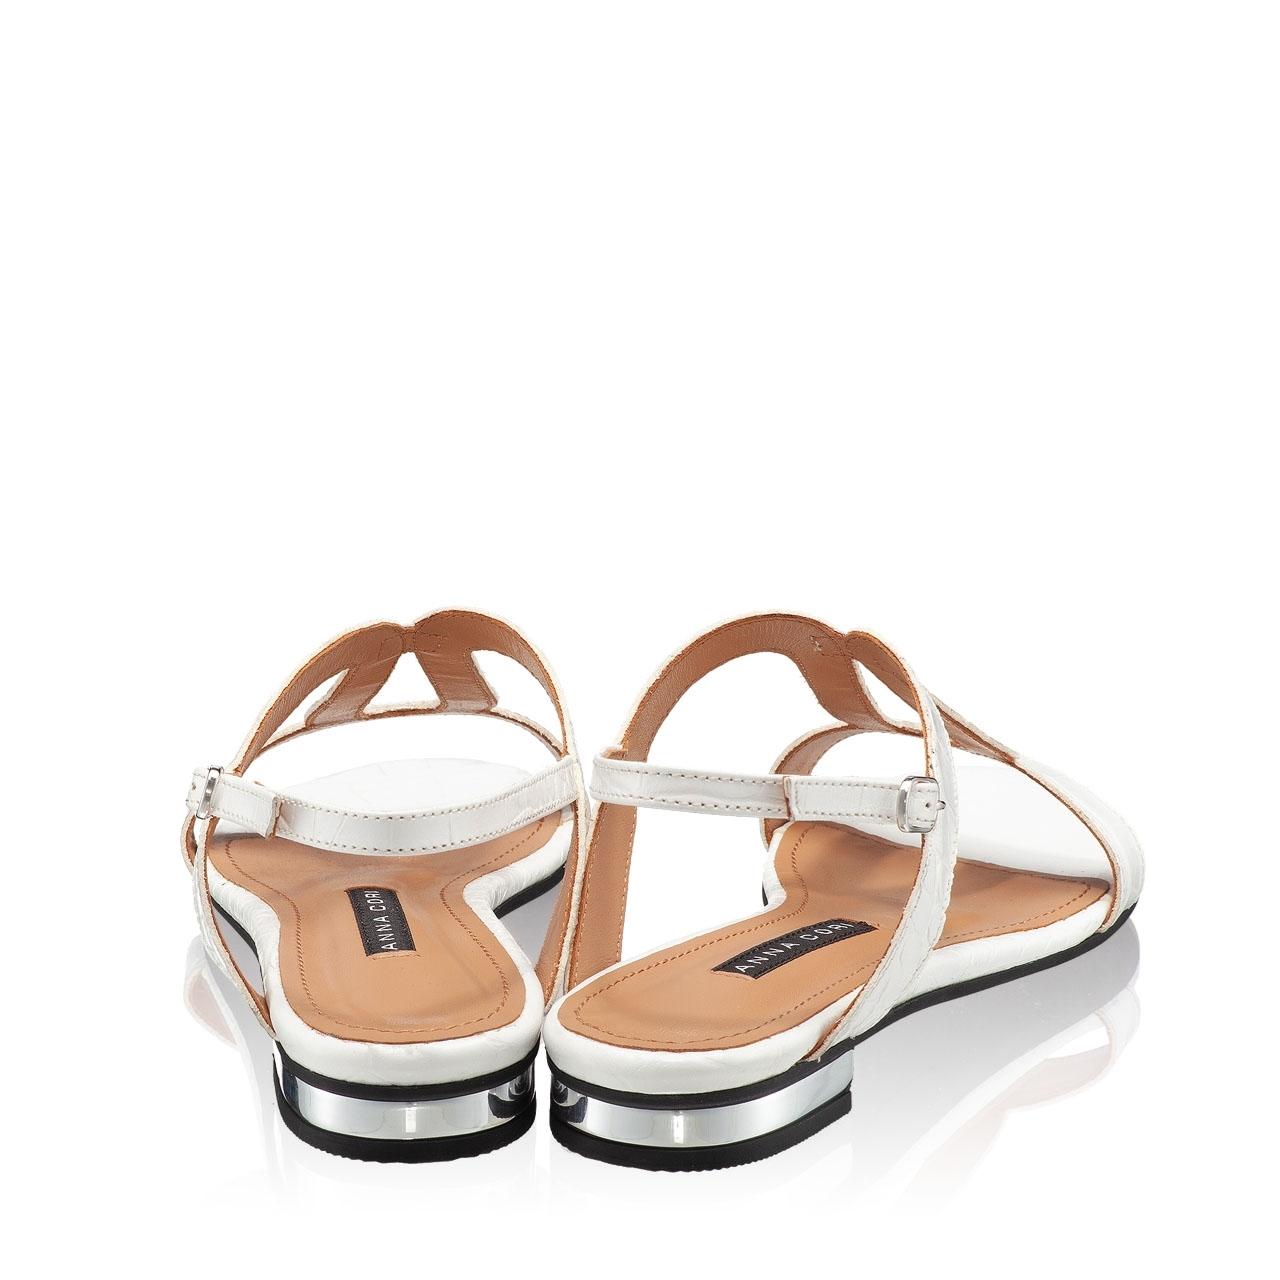 Imagine Sandale Dama 5844 Croco Alb